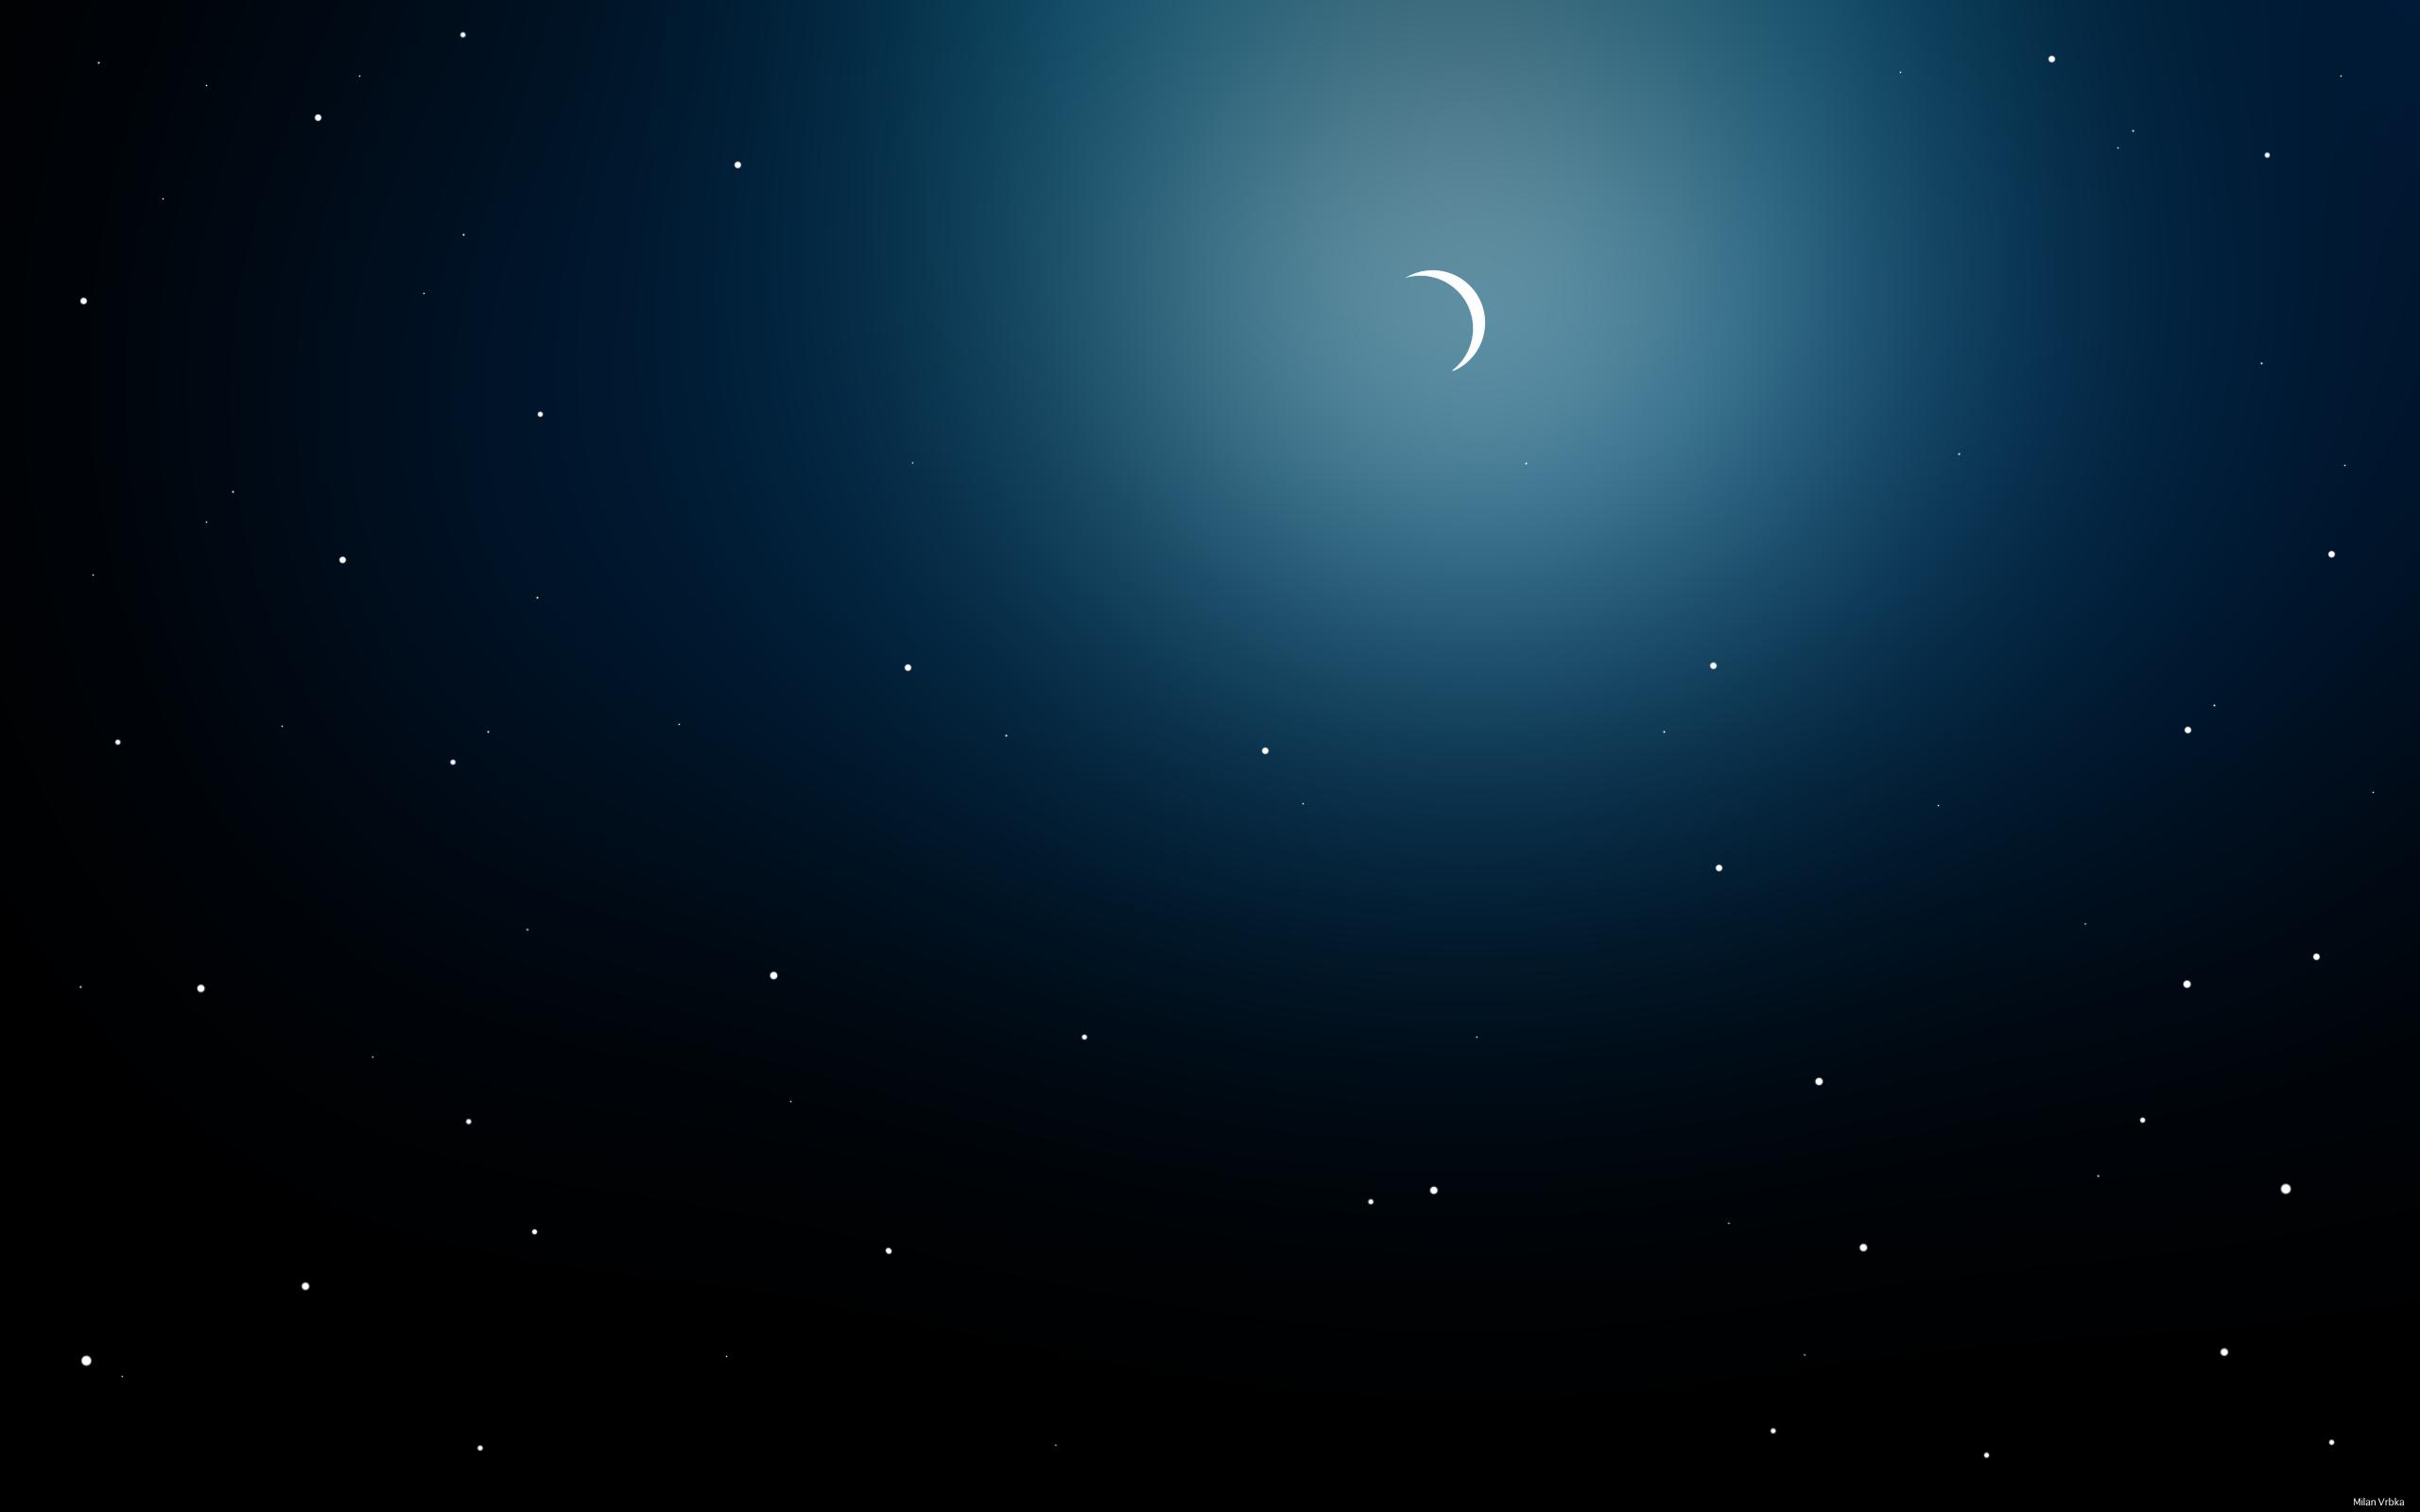 Deep Dive Into Darkness Night Sky Wallpaper Starry Night Wallpaper Night Sky Hd